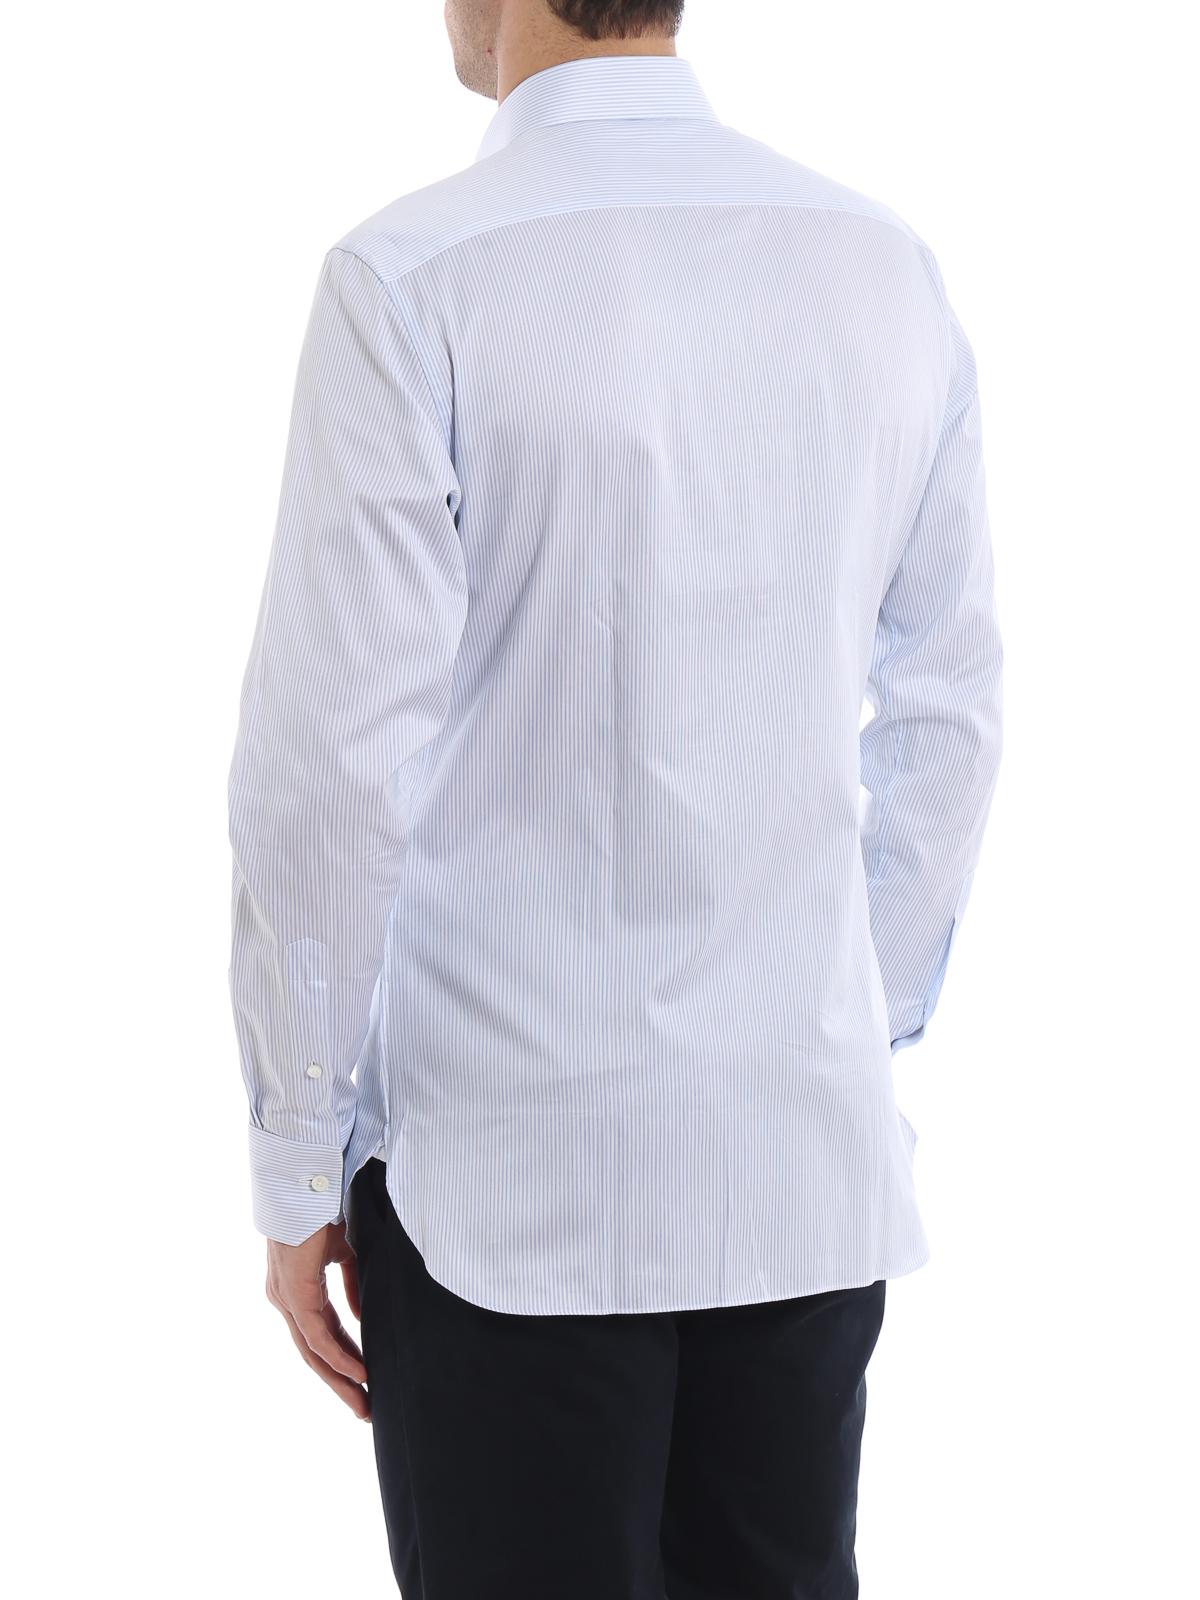 98d6609d63 Ermenegildo Zegna - Trofeo striped cotton shirt - shirts - 5010409MS0MT